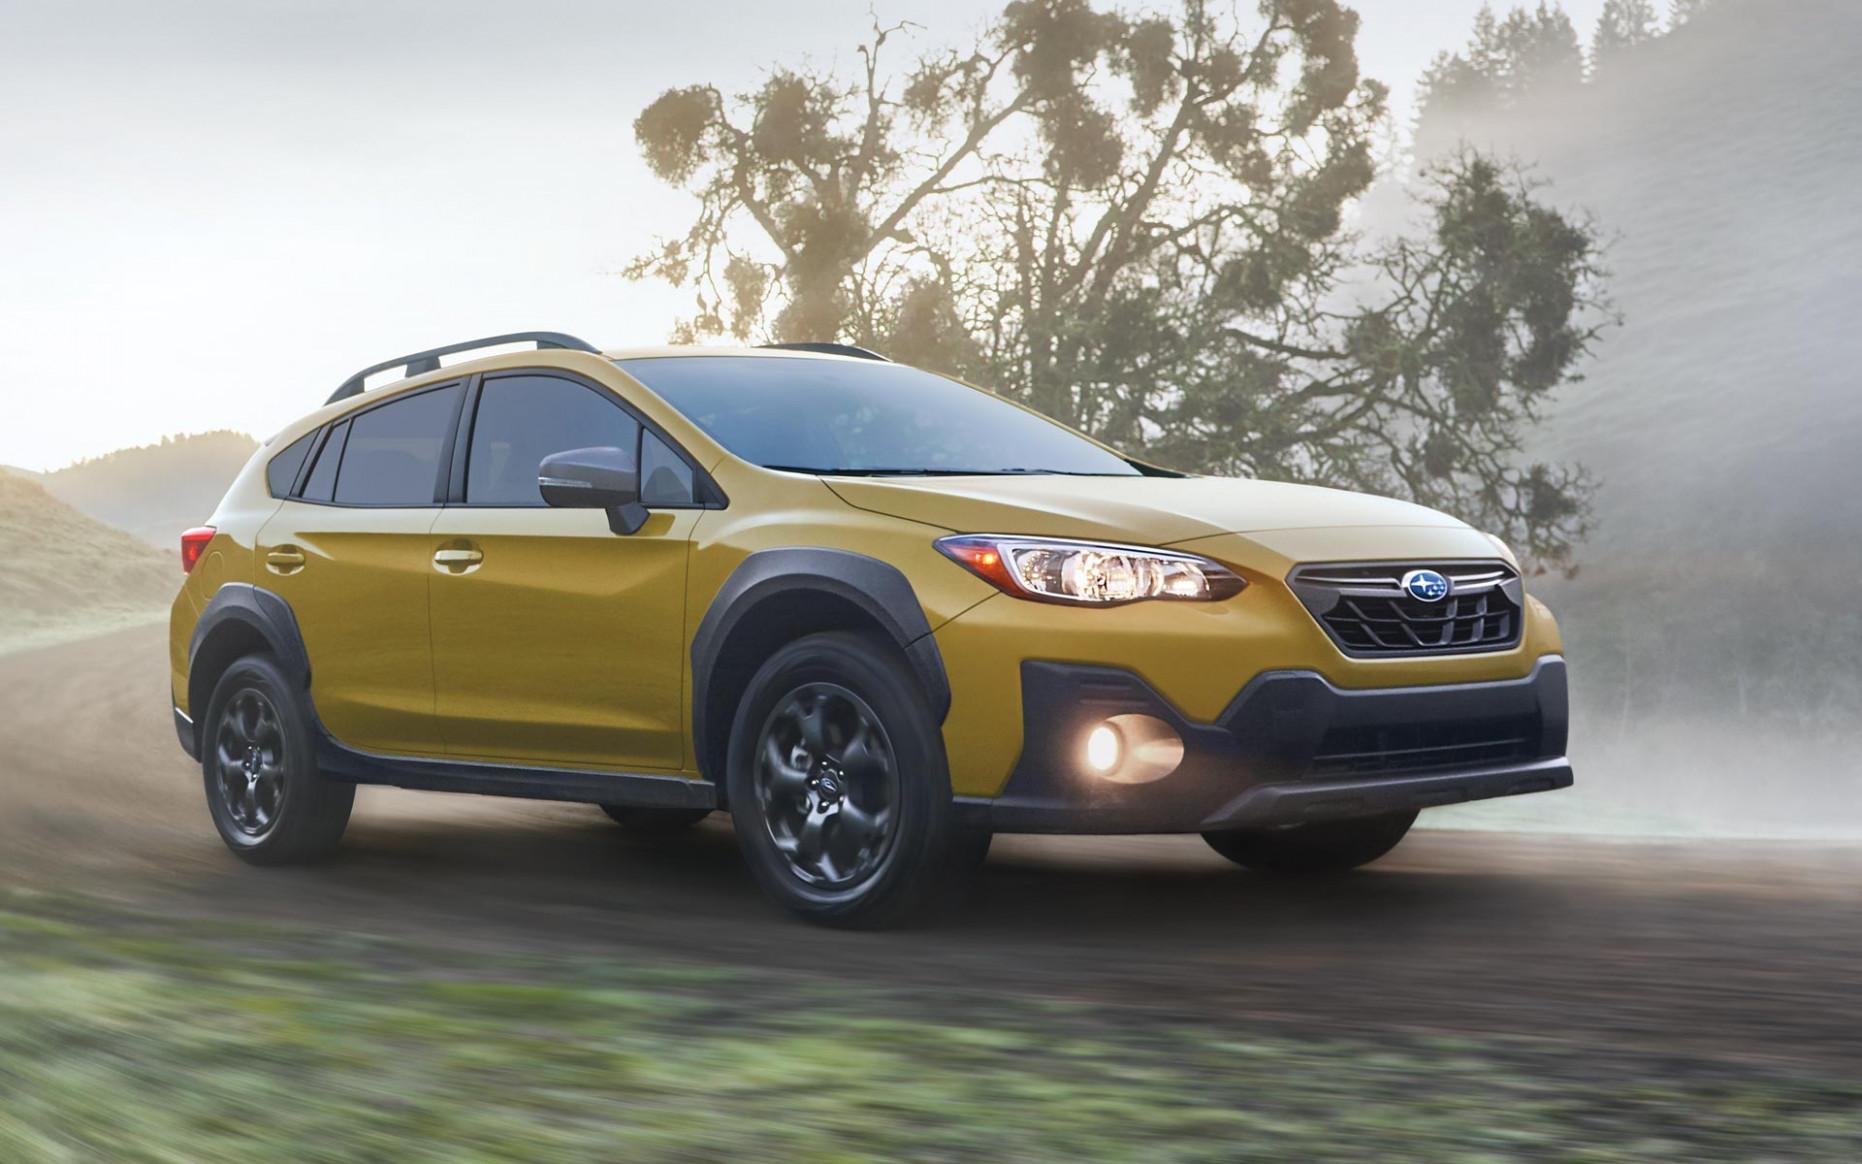 Performance and New Engine Subaru Crosstrek 2022 Release Date